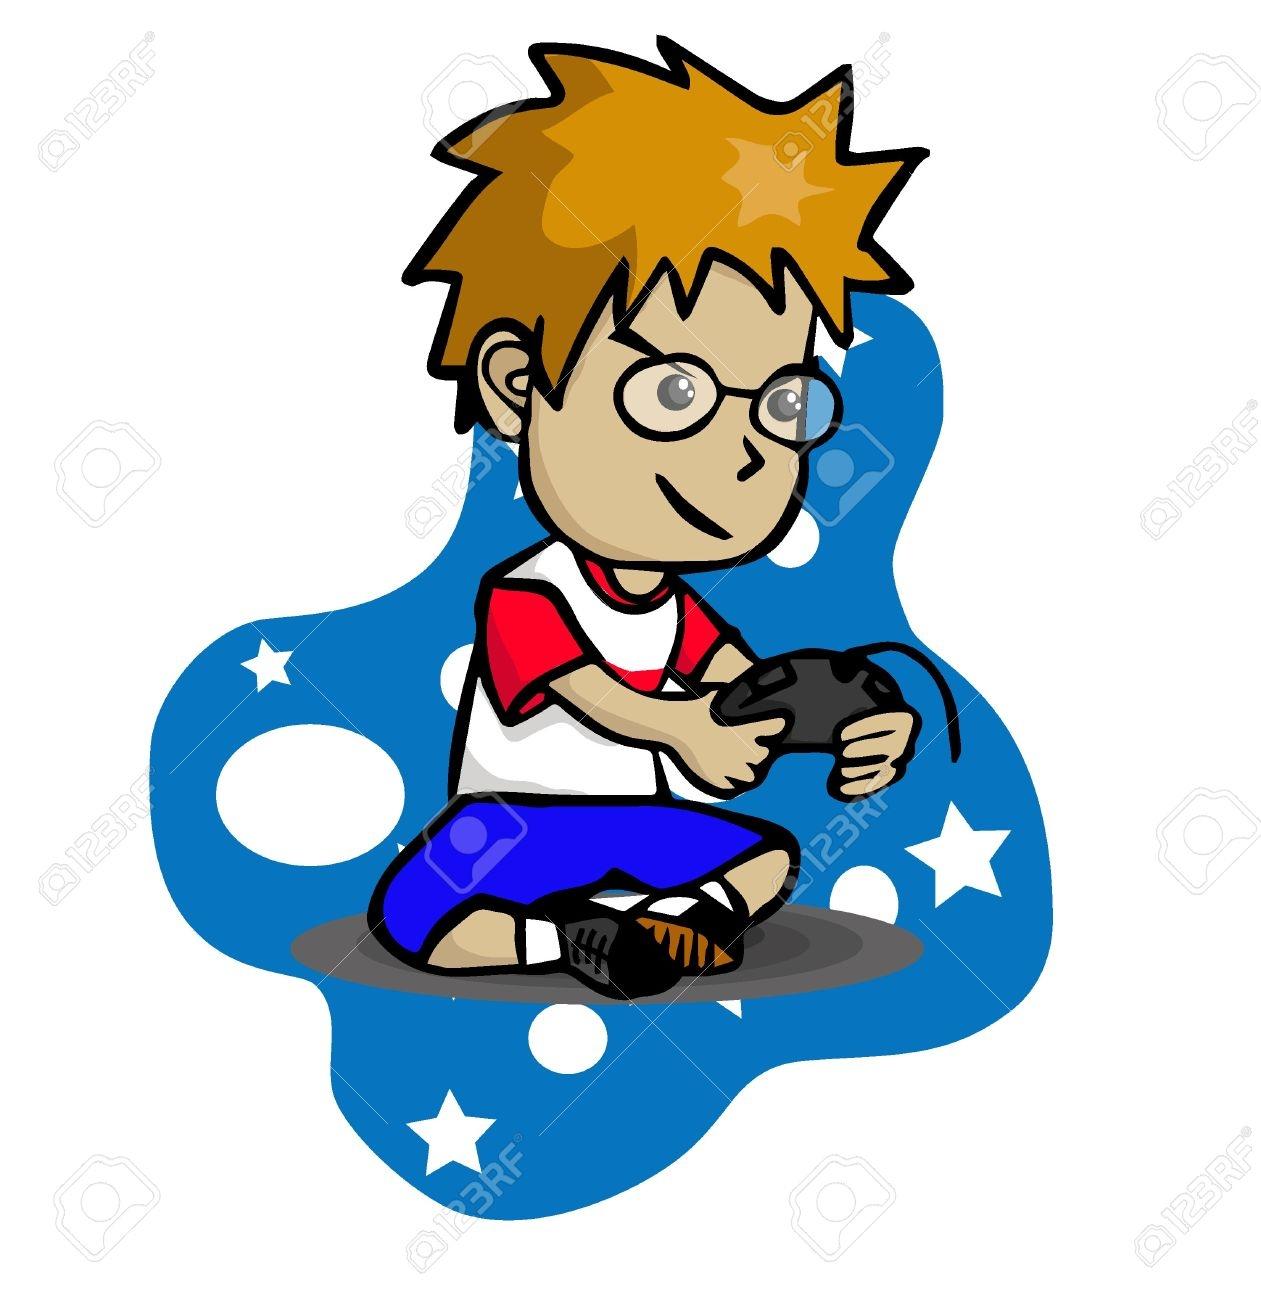 1261x1300 Boy Playing Video Games Clip Art My Site